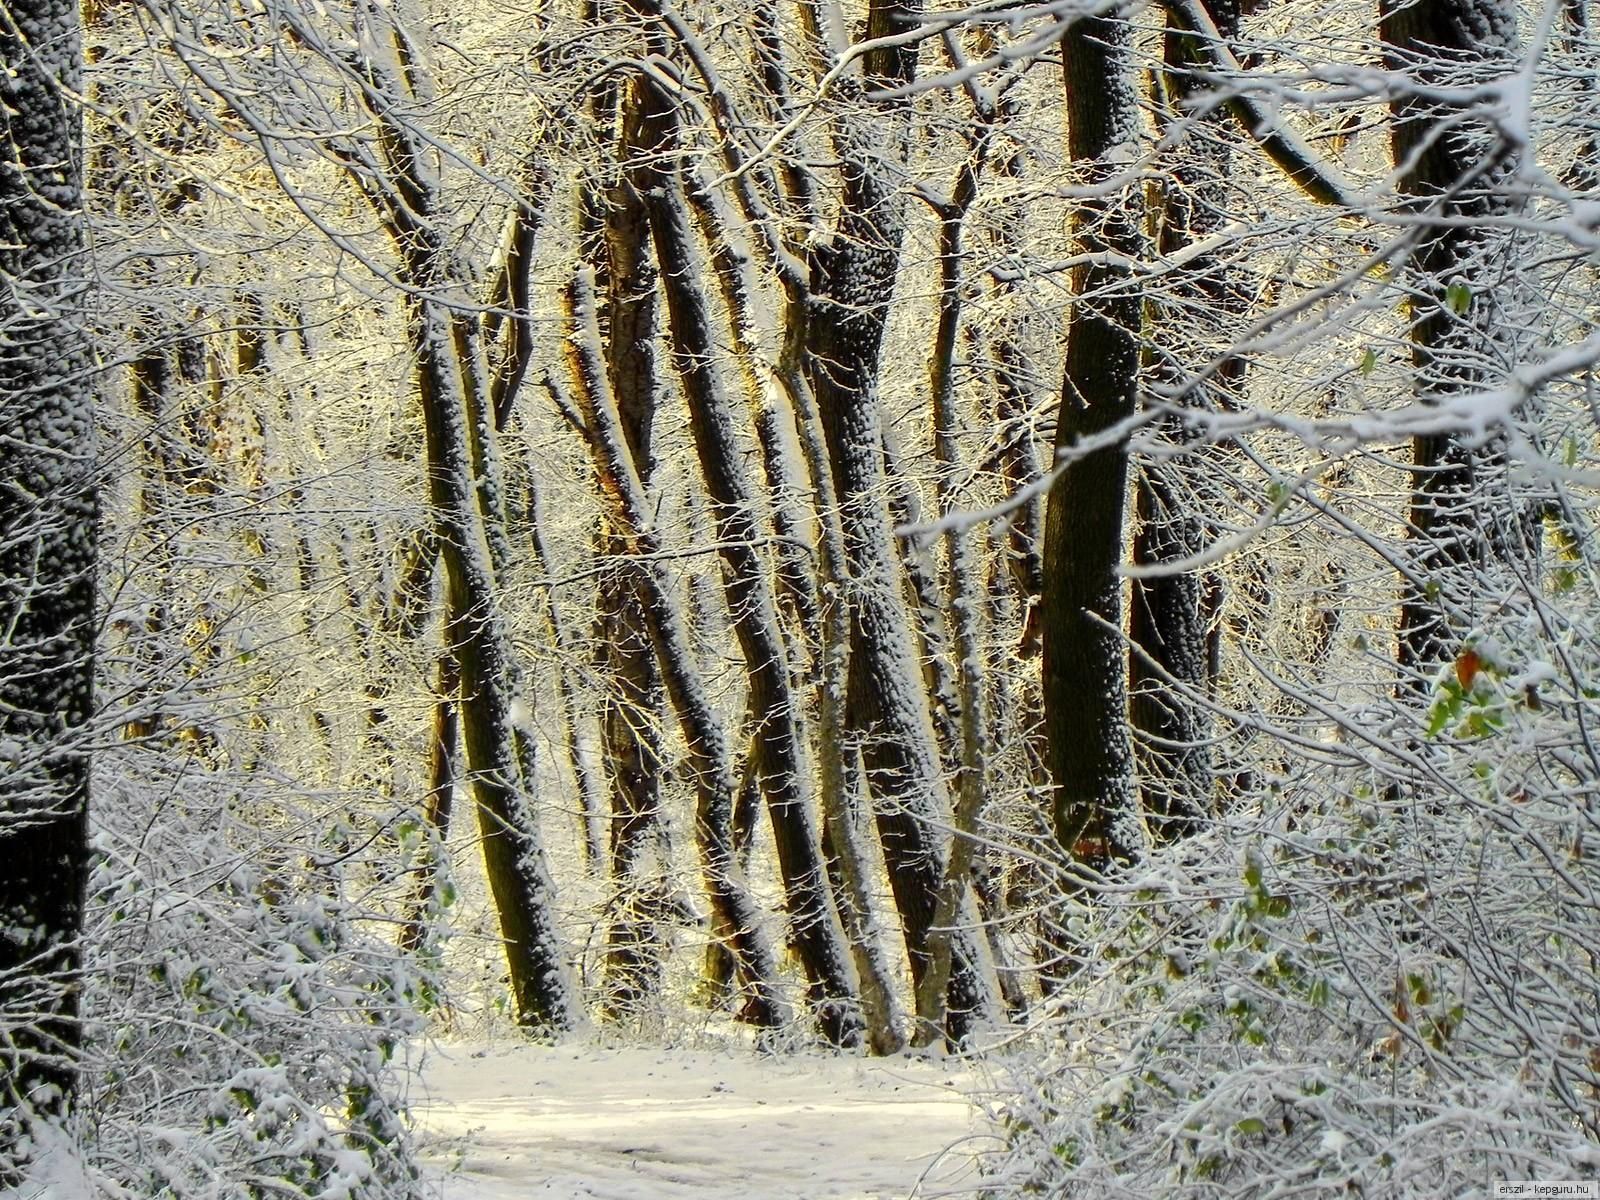 Wallpaper ไหนว่าปีนี้จะหนาวสุดในรอบ 30 ปี 50 Pic 229209-svetik